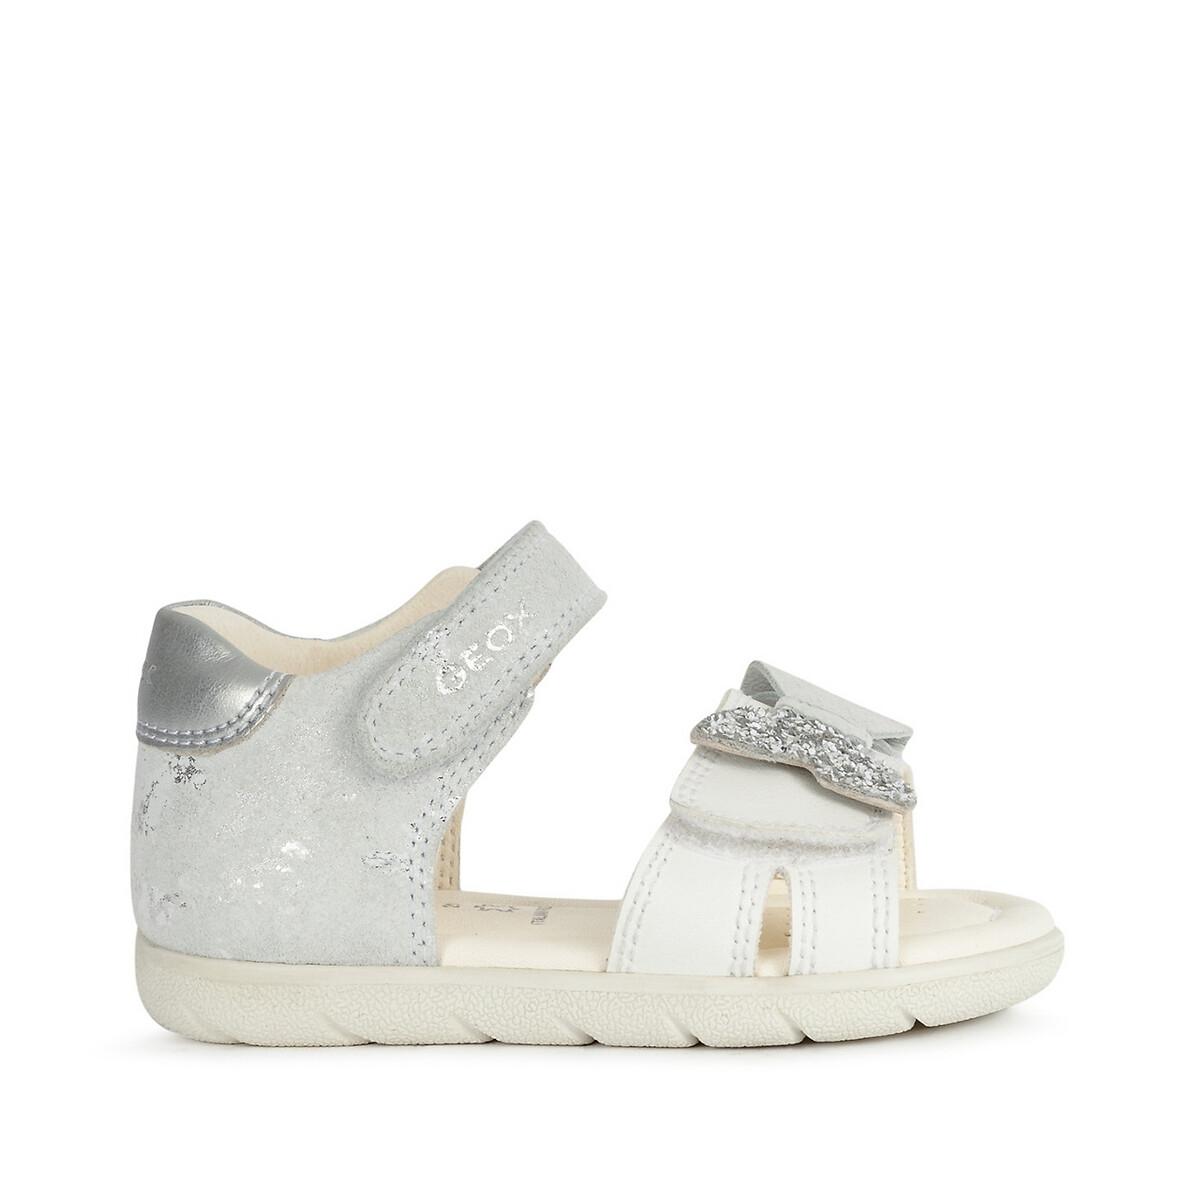 Children's Footwear Kids Alul Leather Sandals